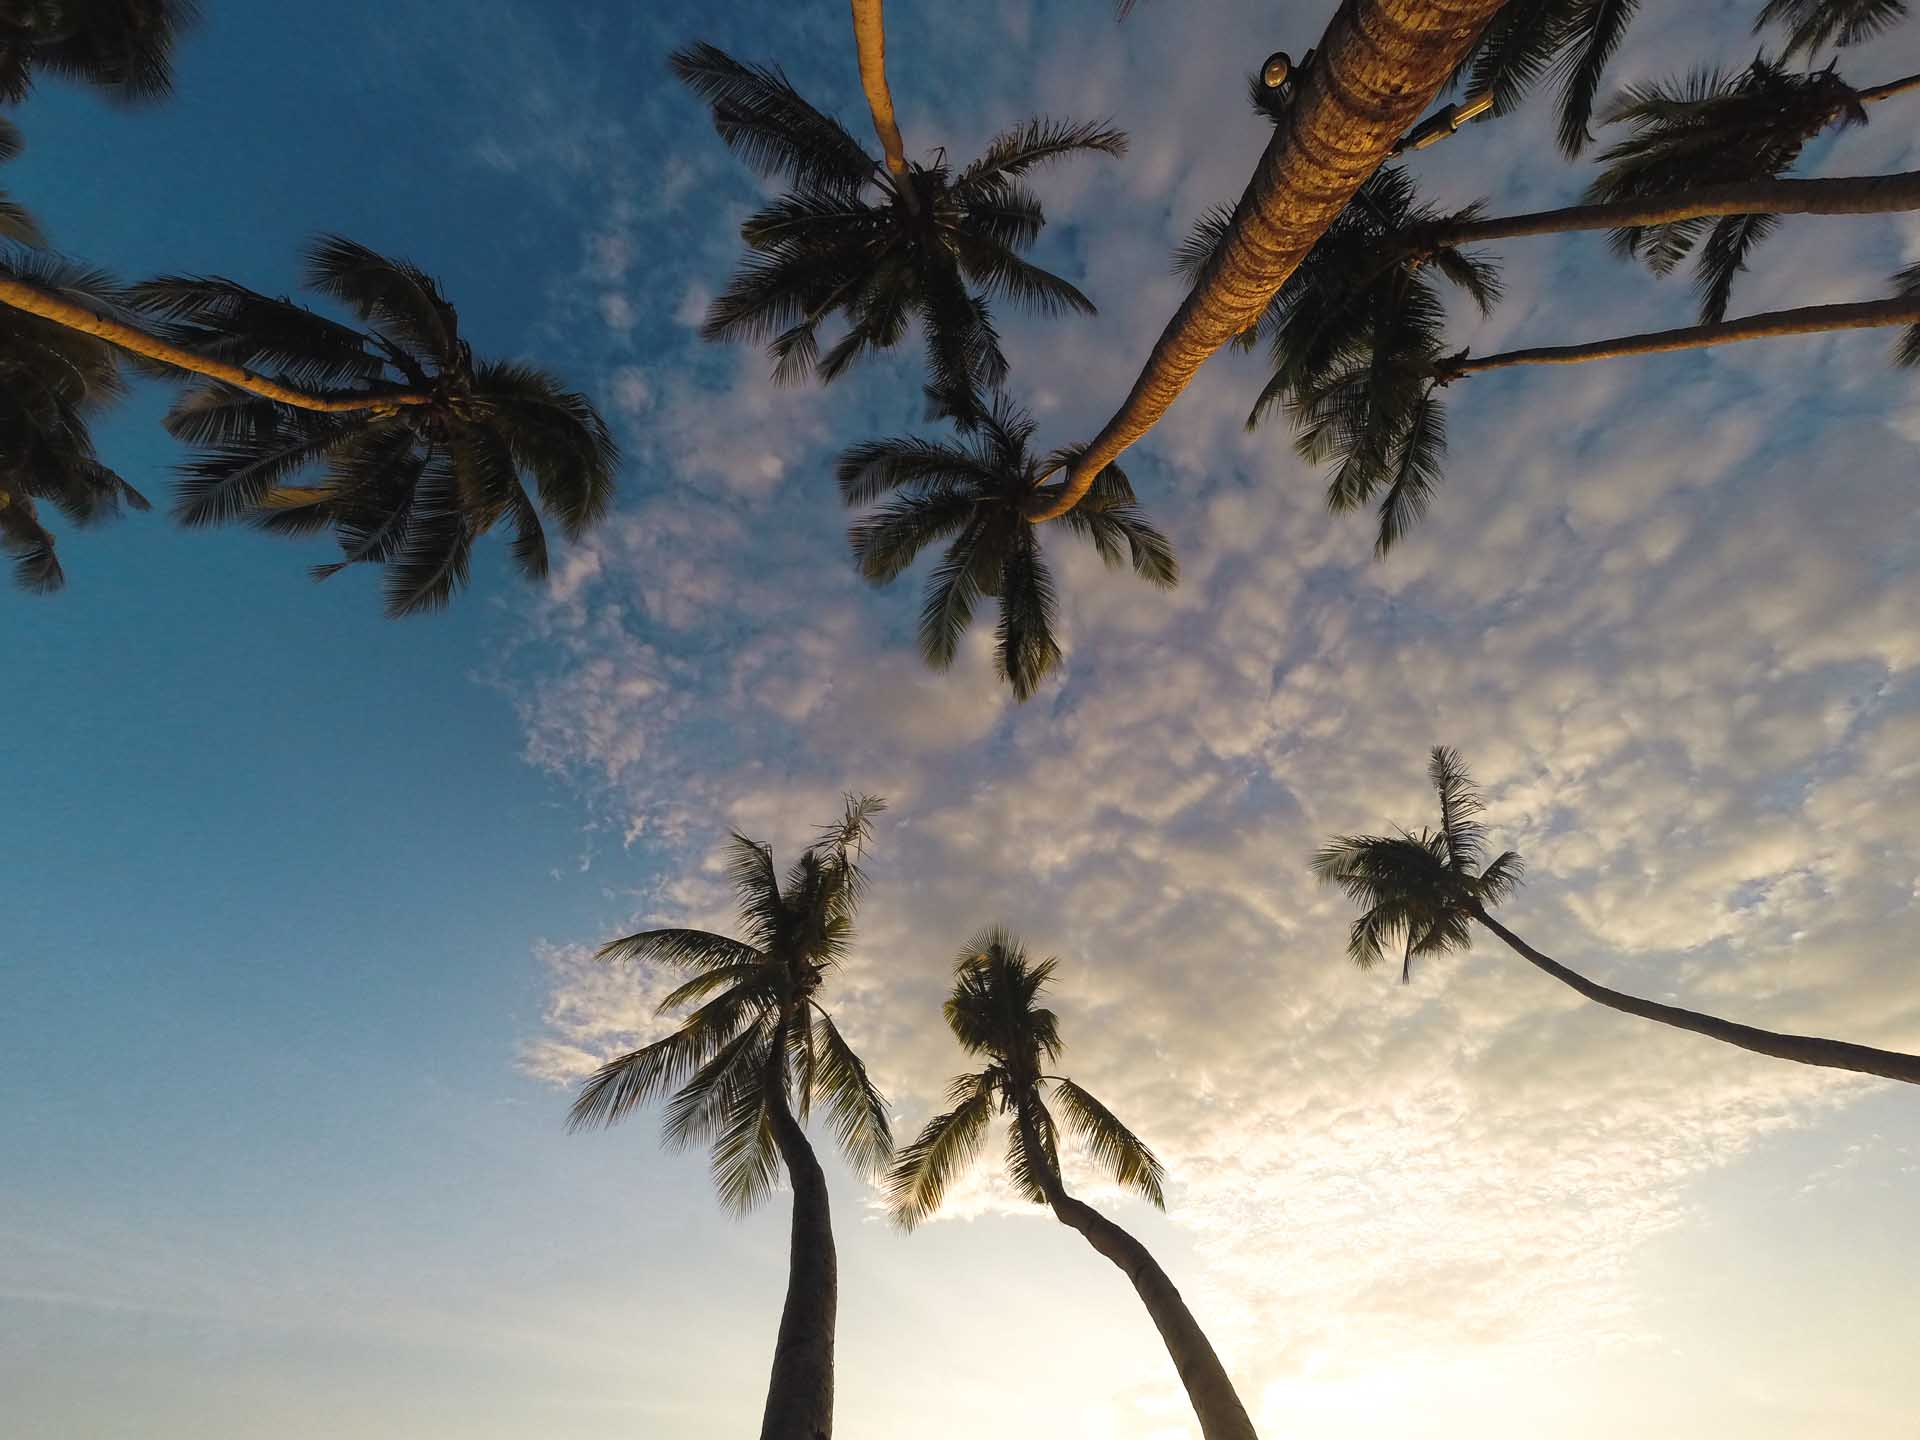 palmtrees in Palawan